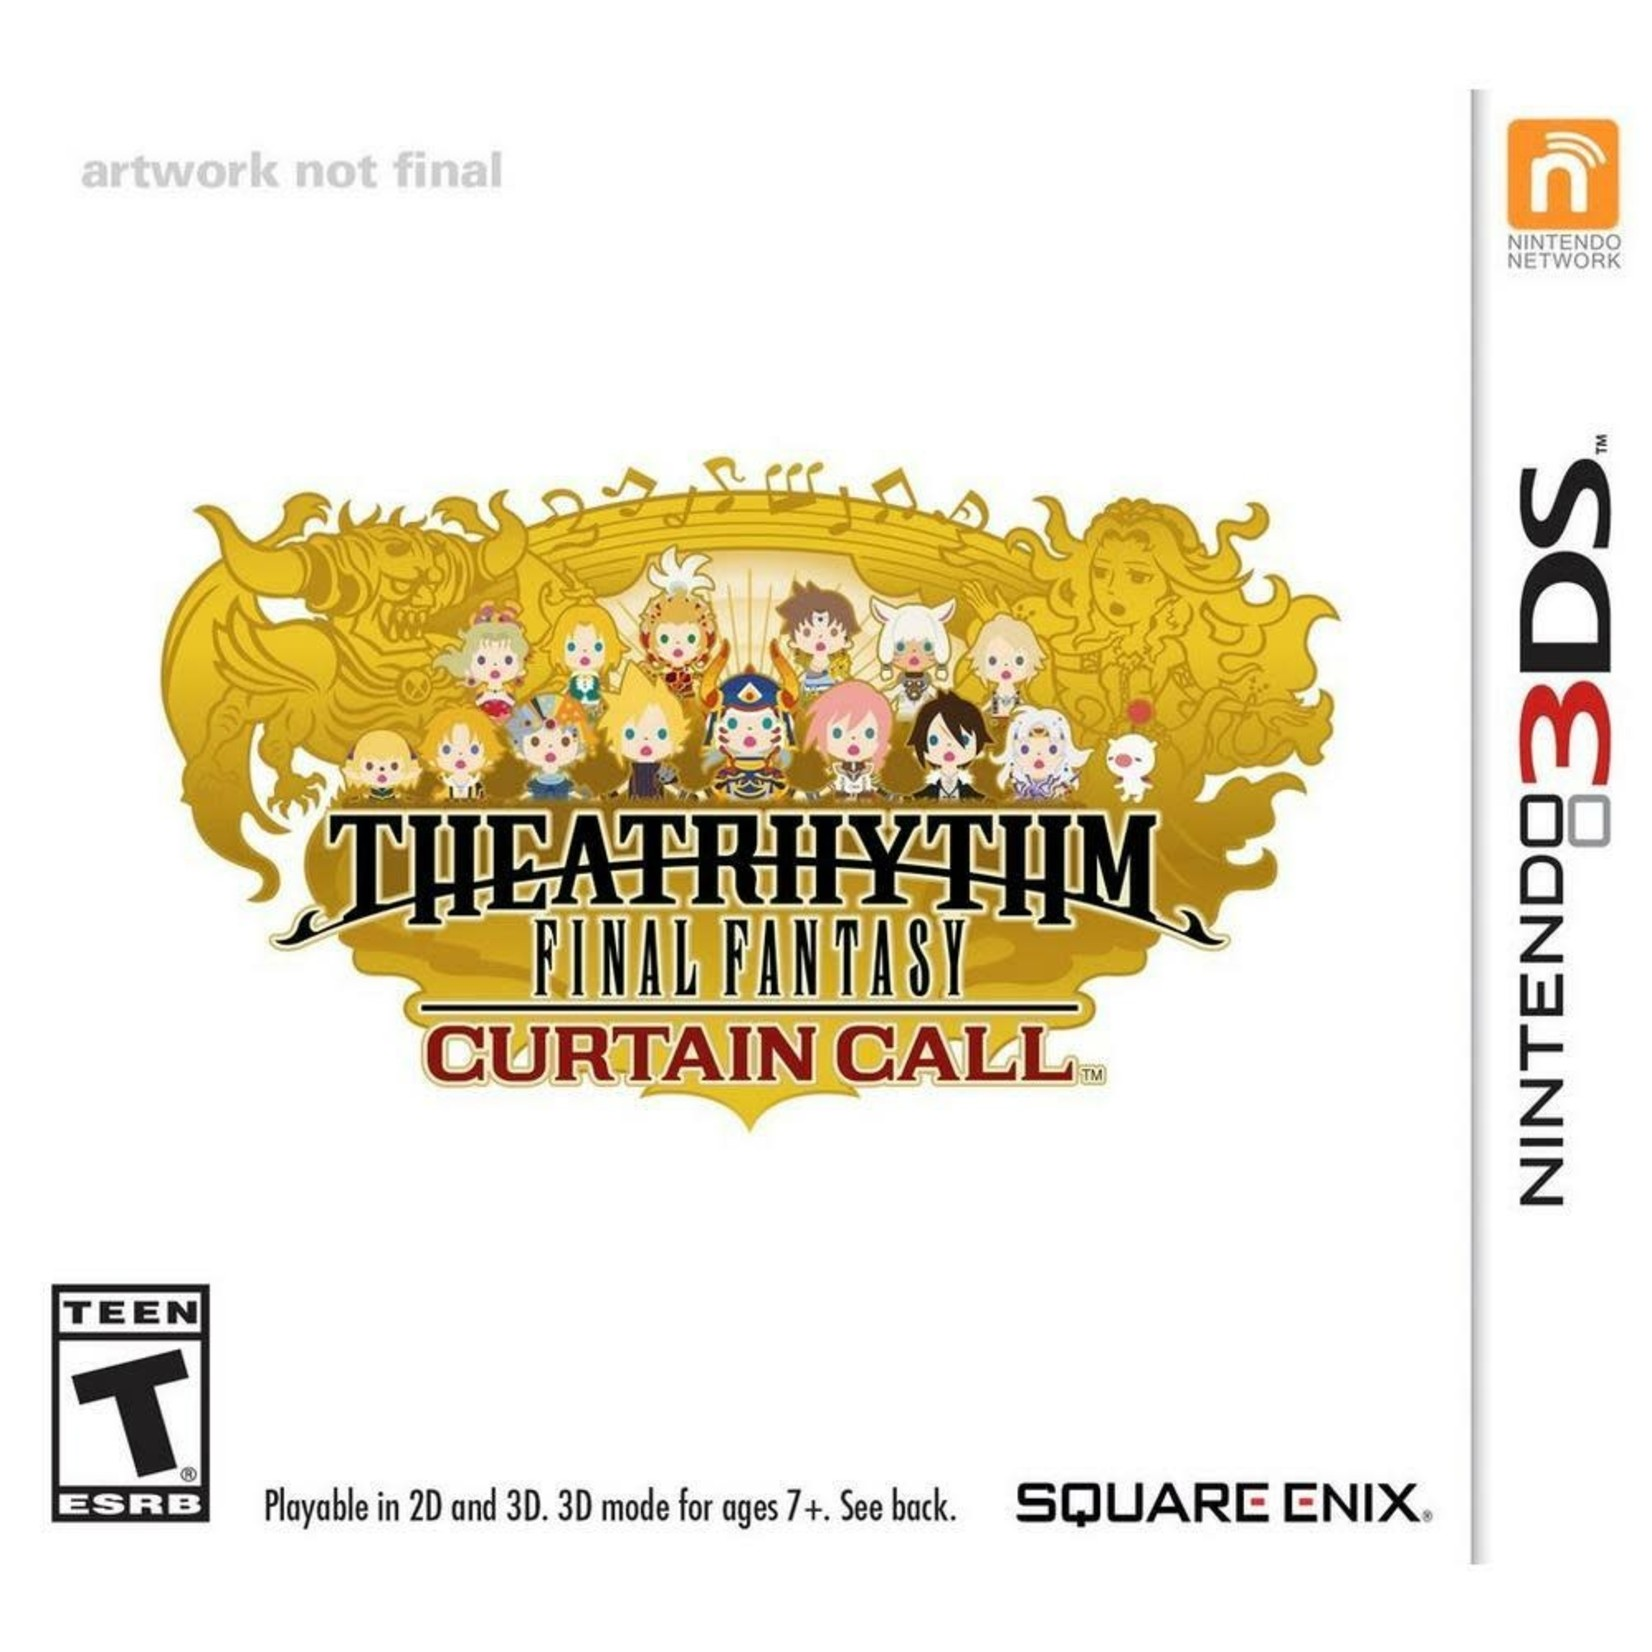 3DS-Theatrhythm Final Fantasy Curtain Call